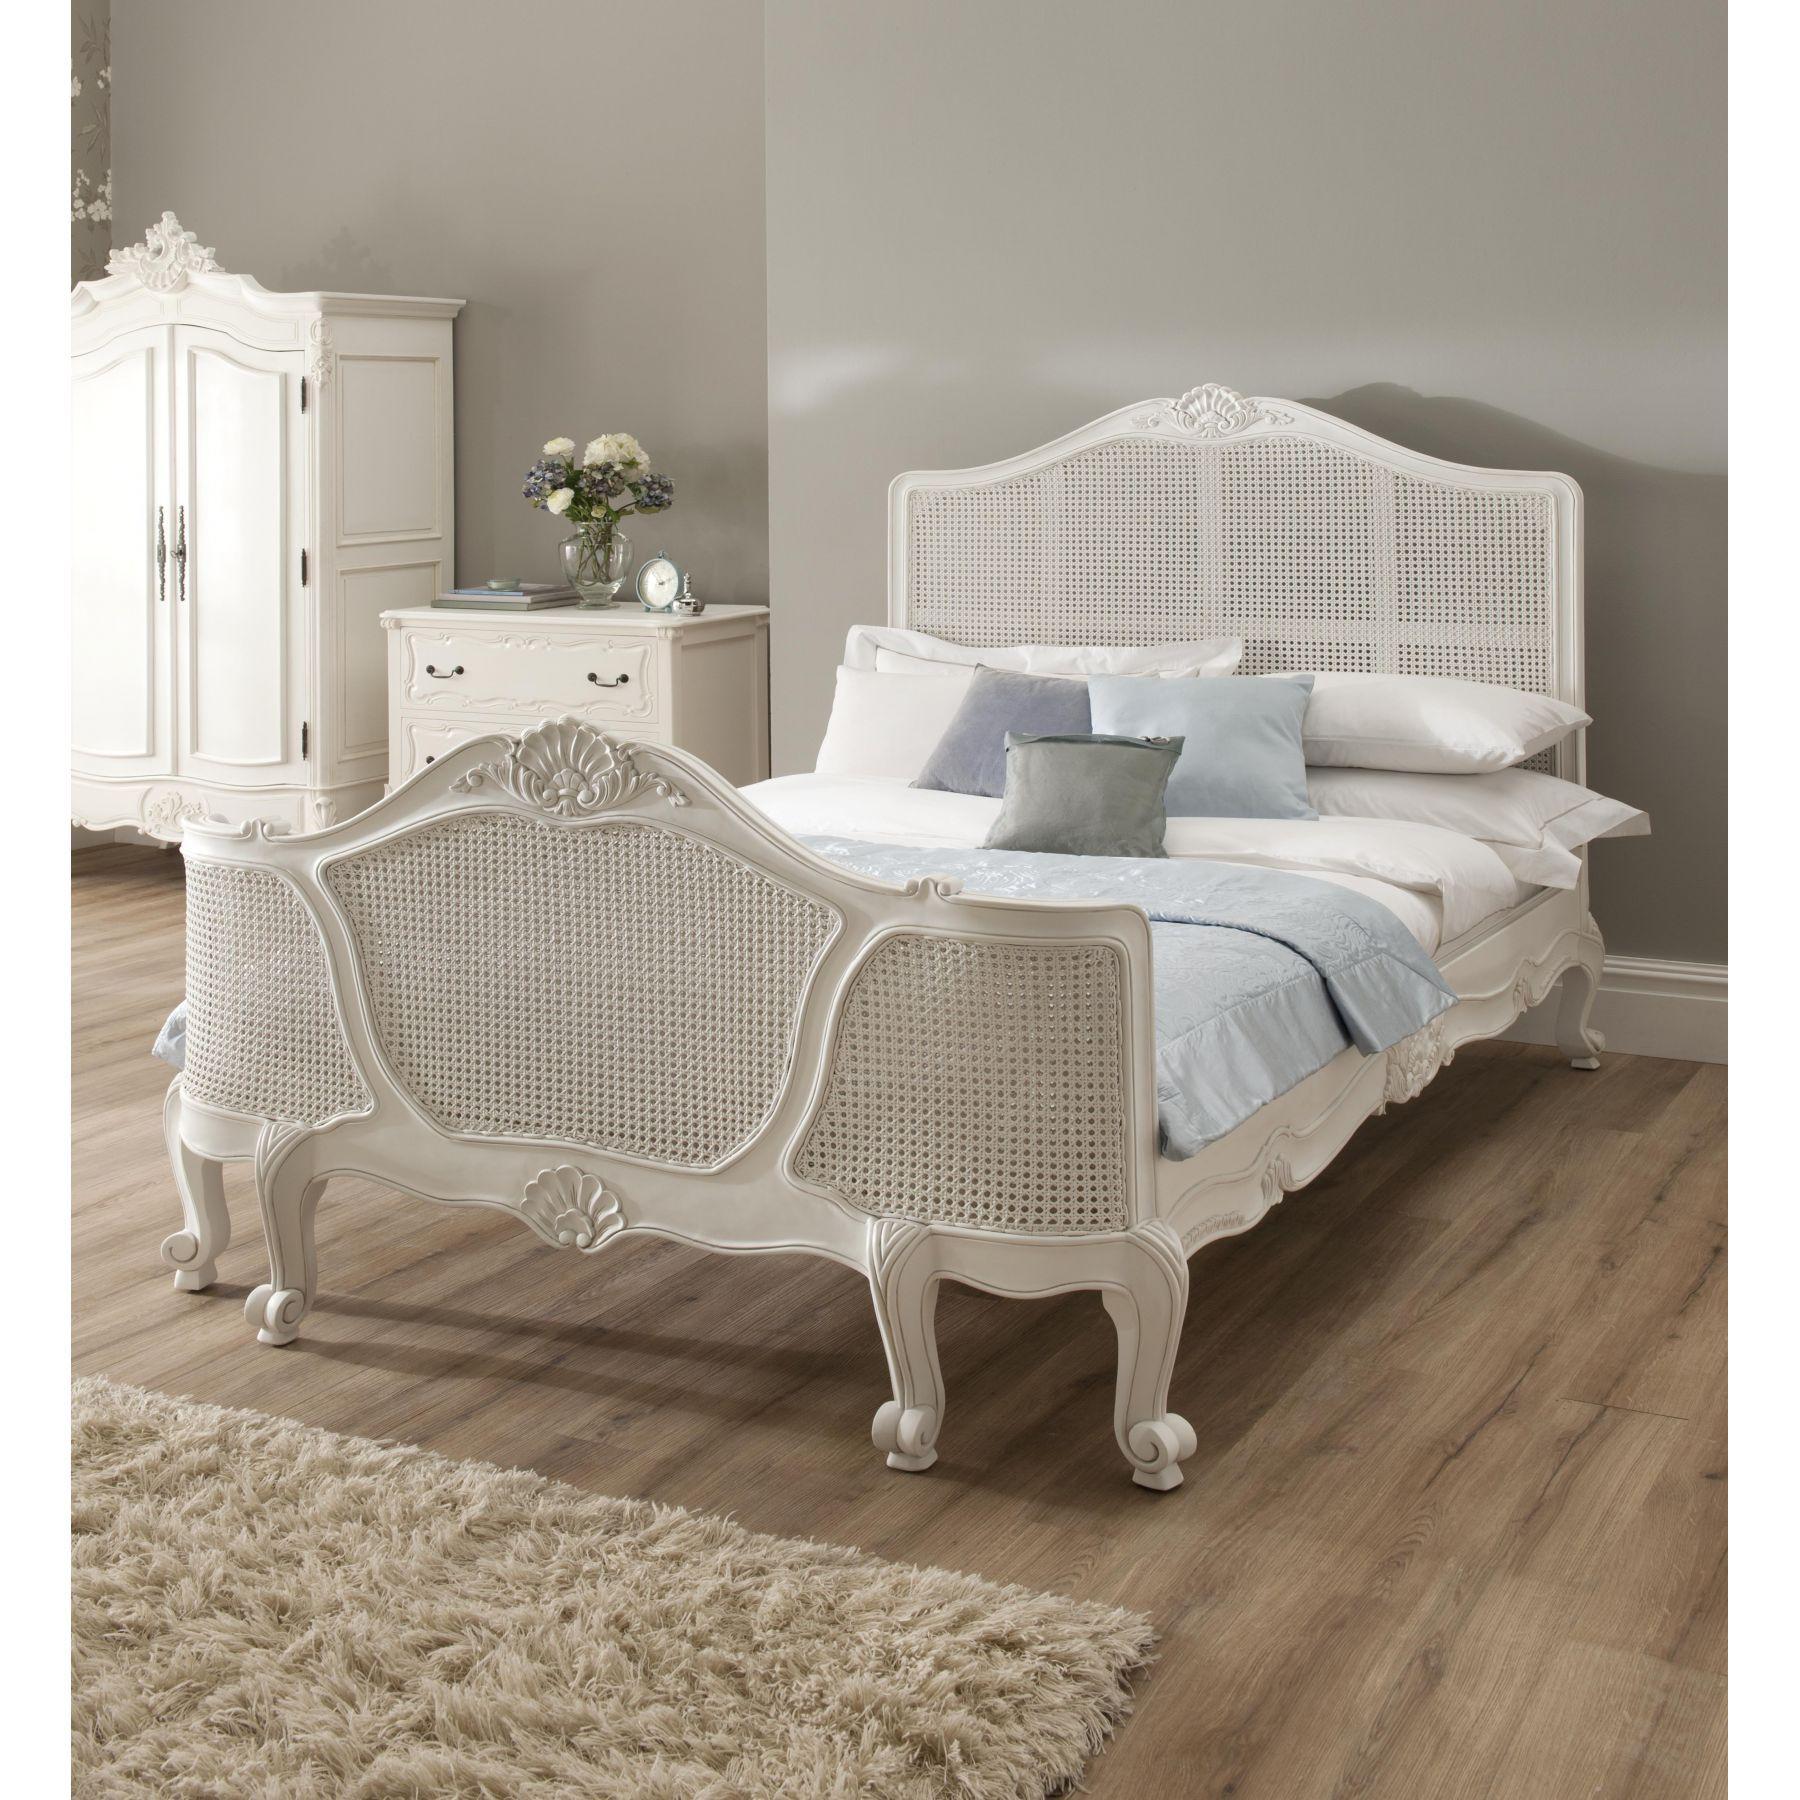 White Wicker Bedroom Suite: Ivory Gloss Bedroom Furniture